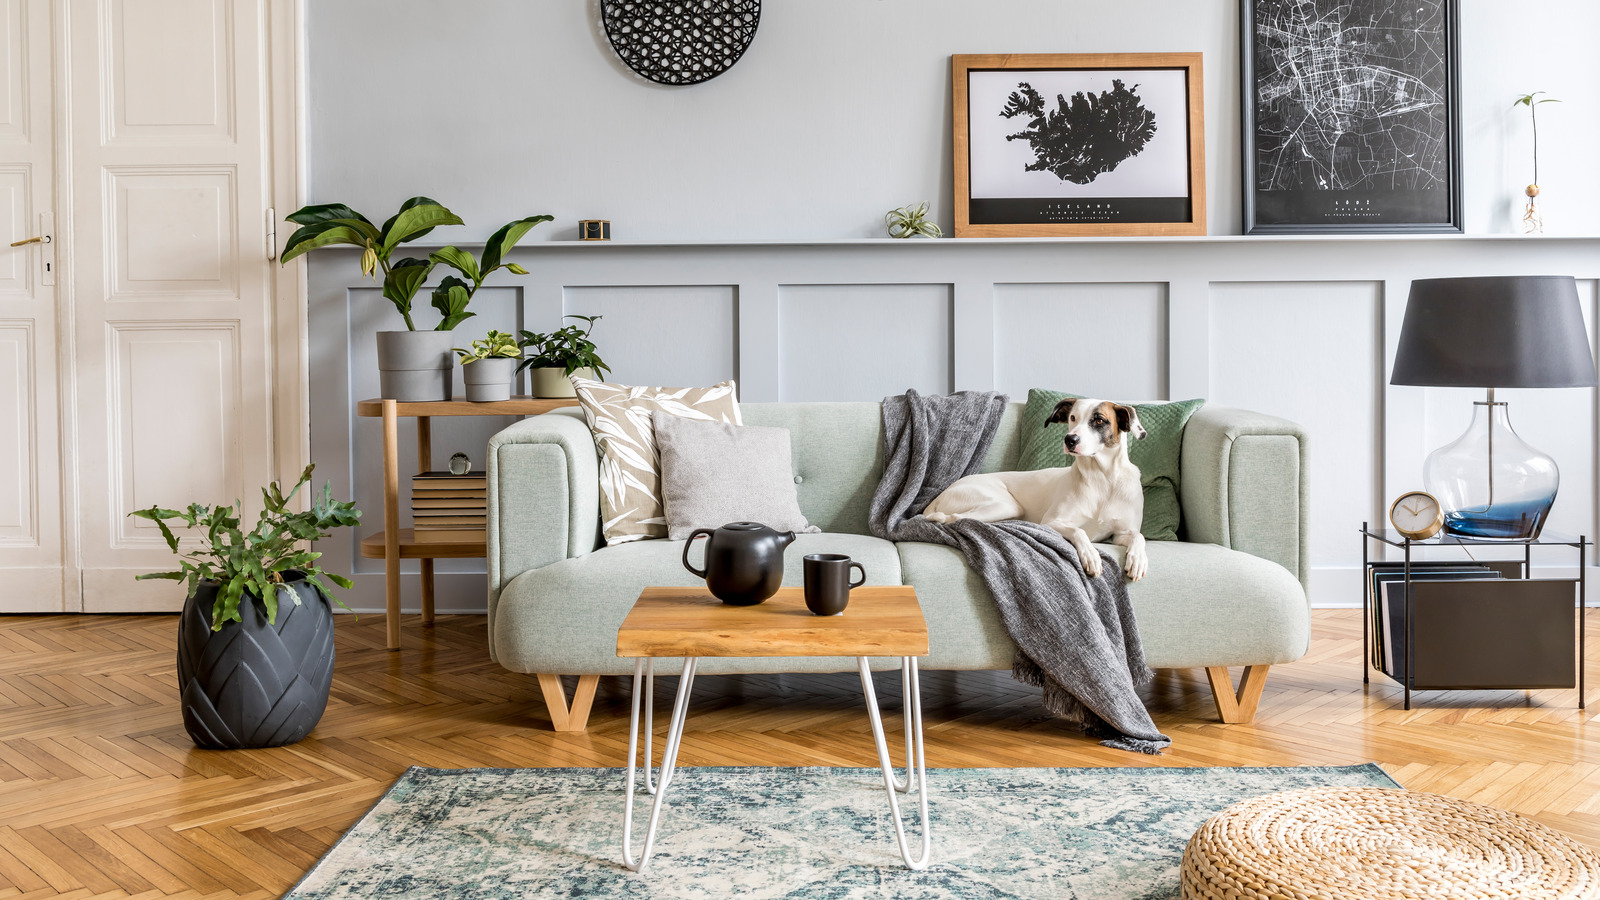 TikTok's Favorite DIY Home Design Trends